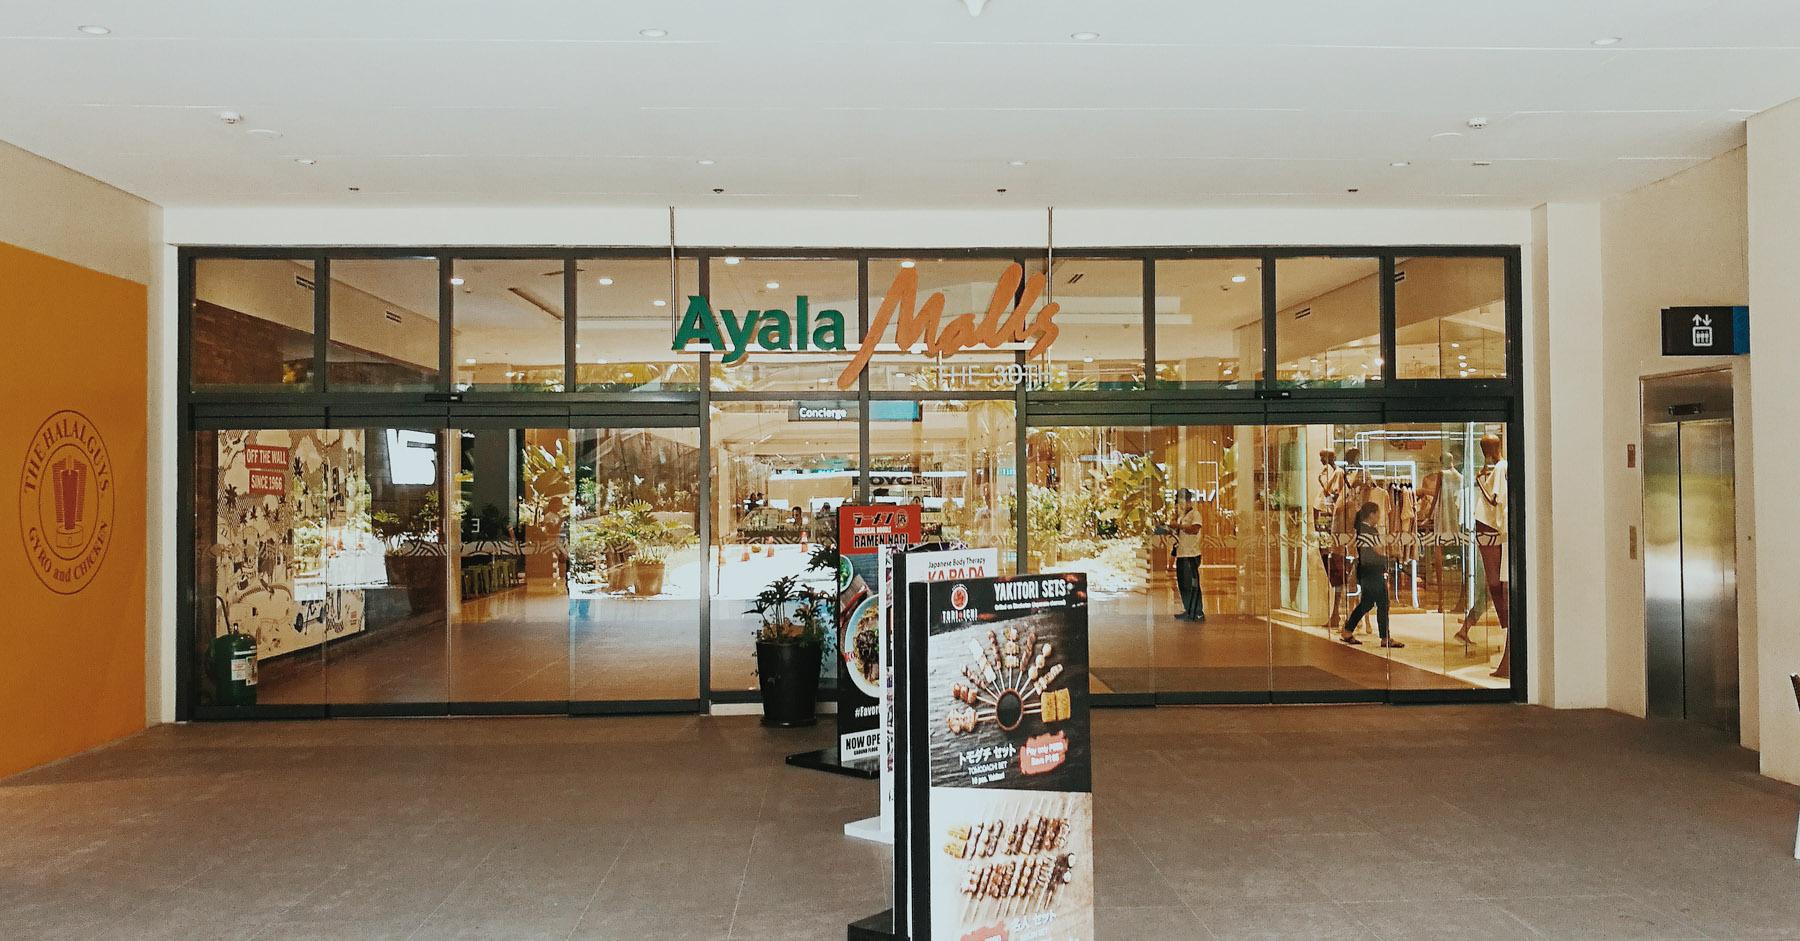 Ayala Center Cebu City Movie Guide - Free Advertisement ...